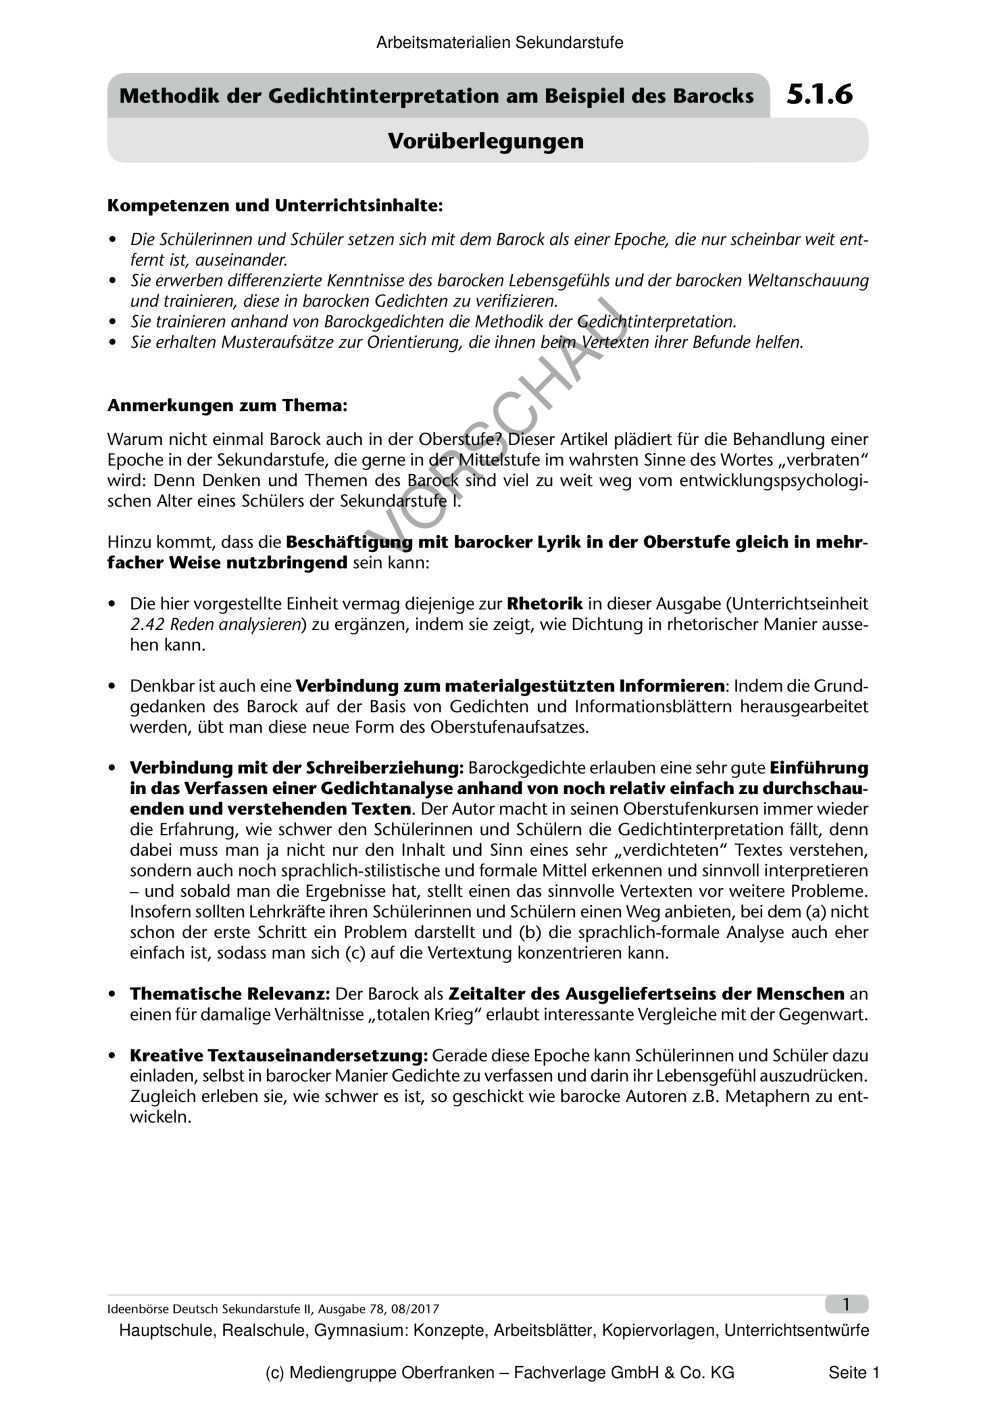 Methodik Der Gedichtinterpretation Am Beispiel Des Barocks Edidact